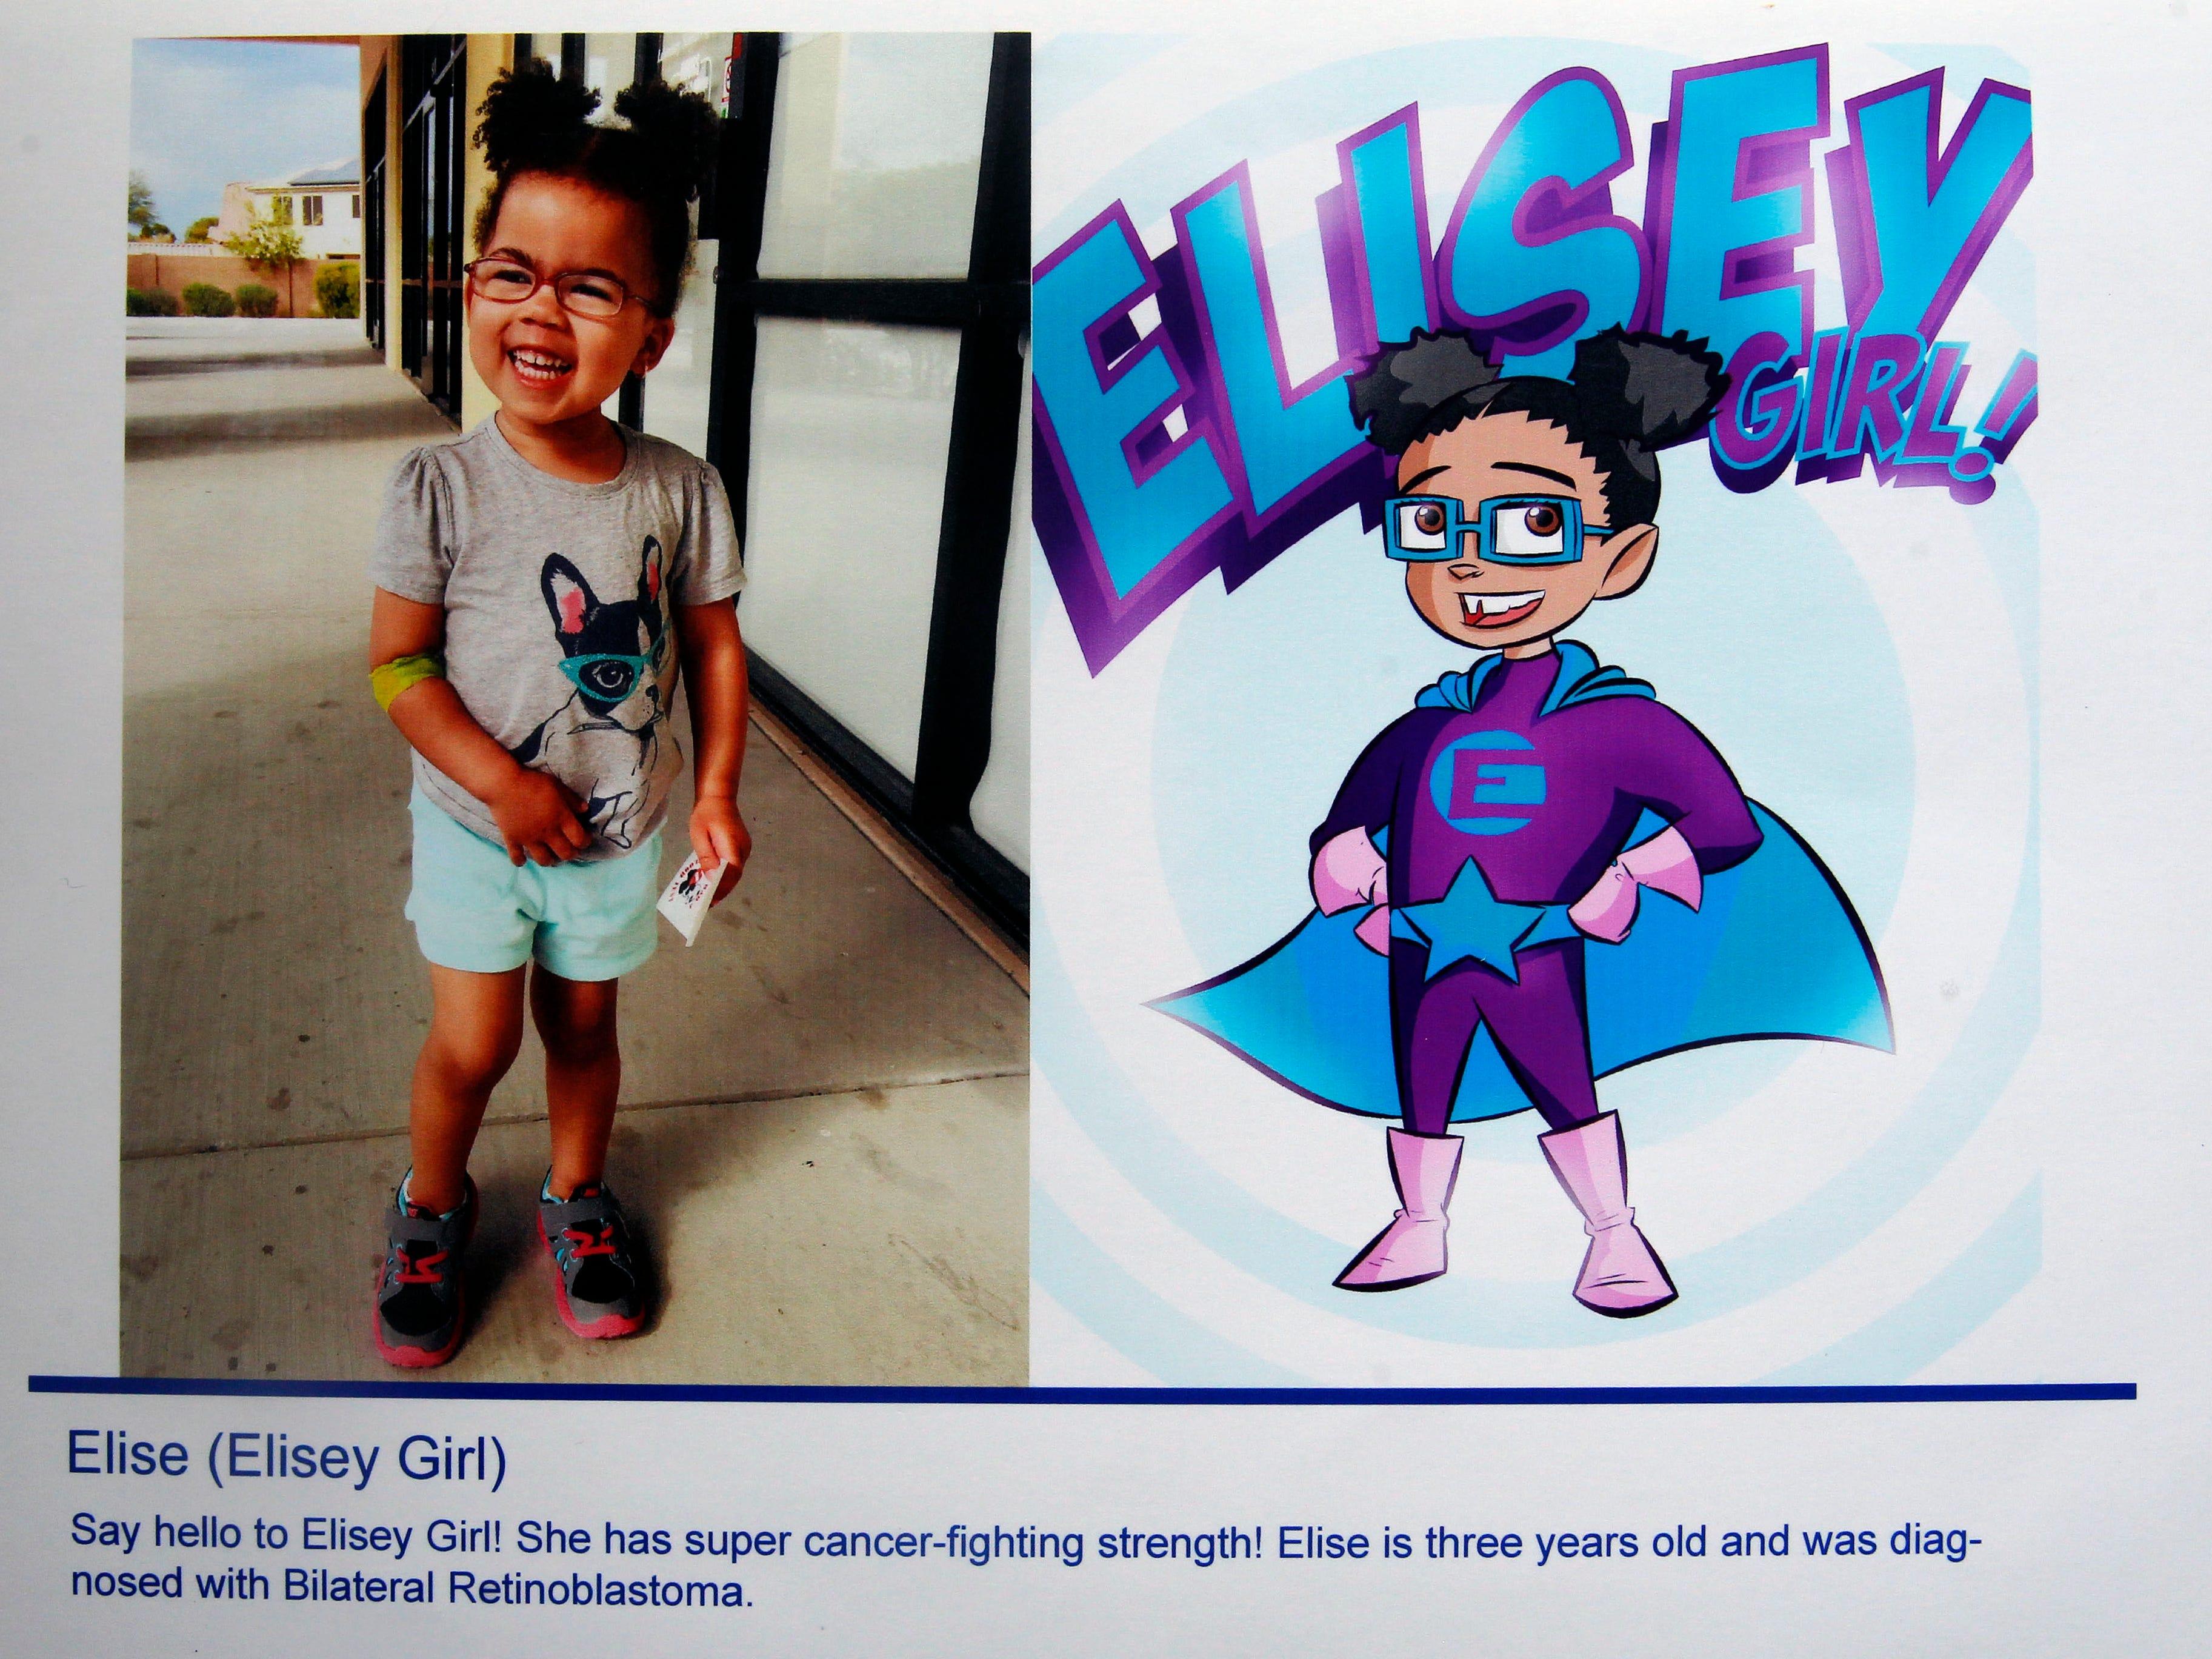 Elise's superhero identity is Elisey Girl.